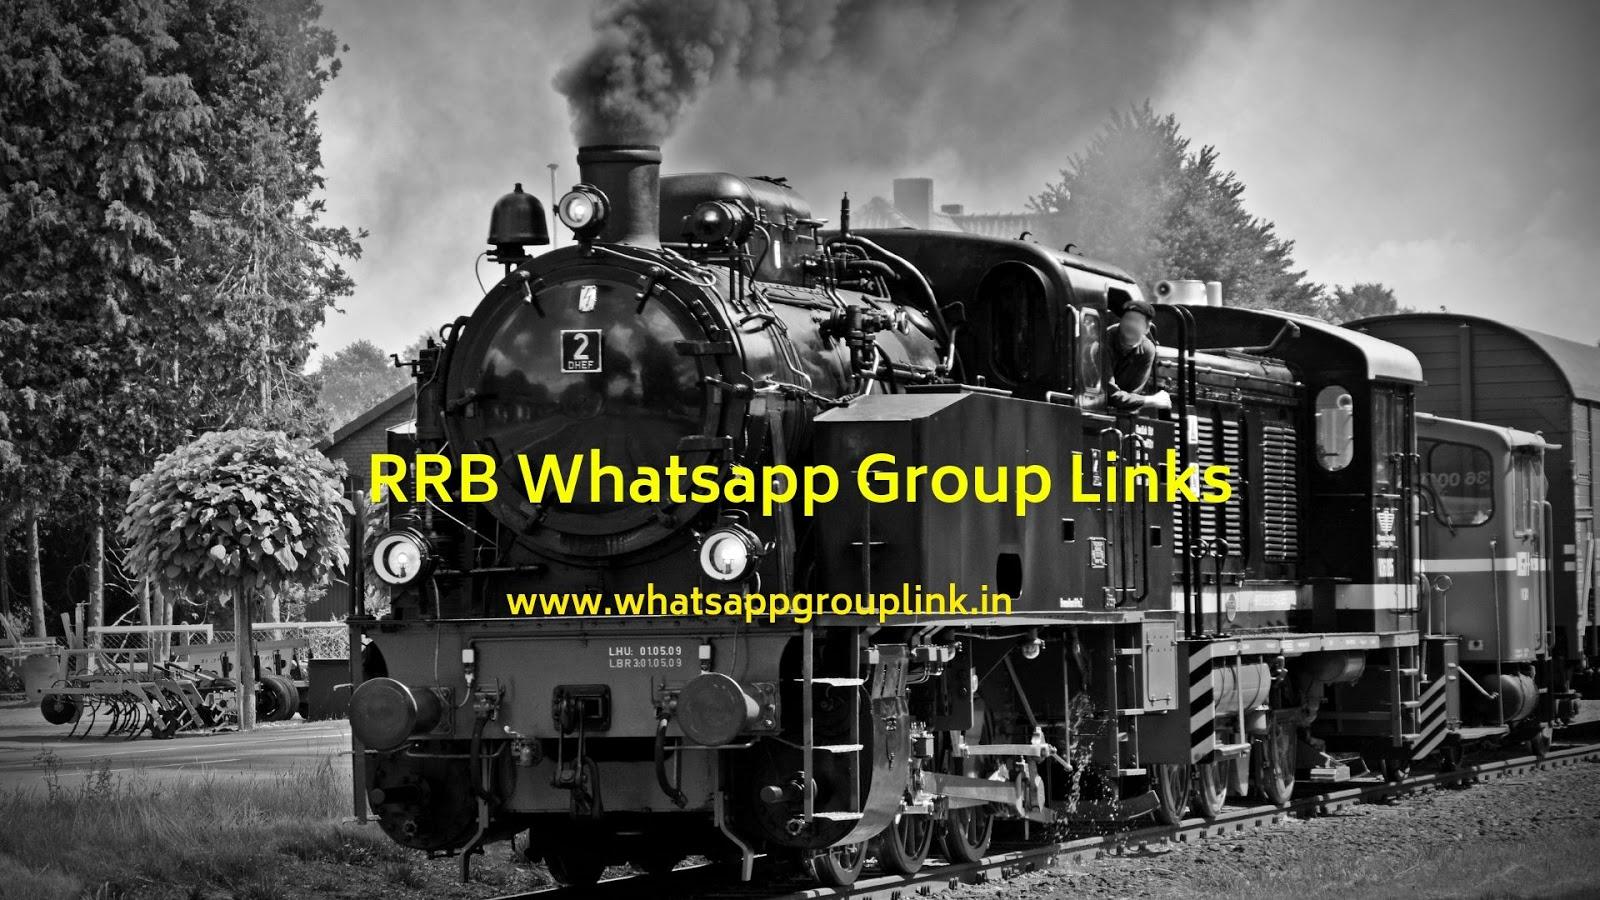 Whatsapp Group Link: RRB Whatsapp Group Links